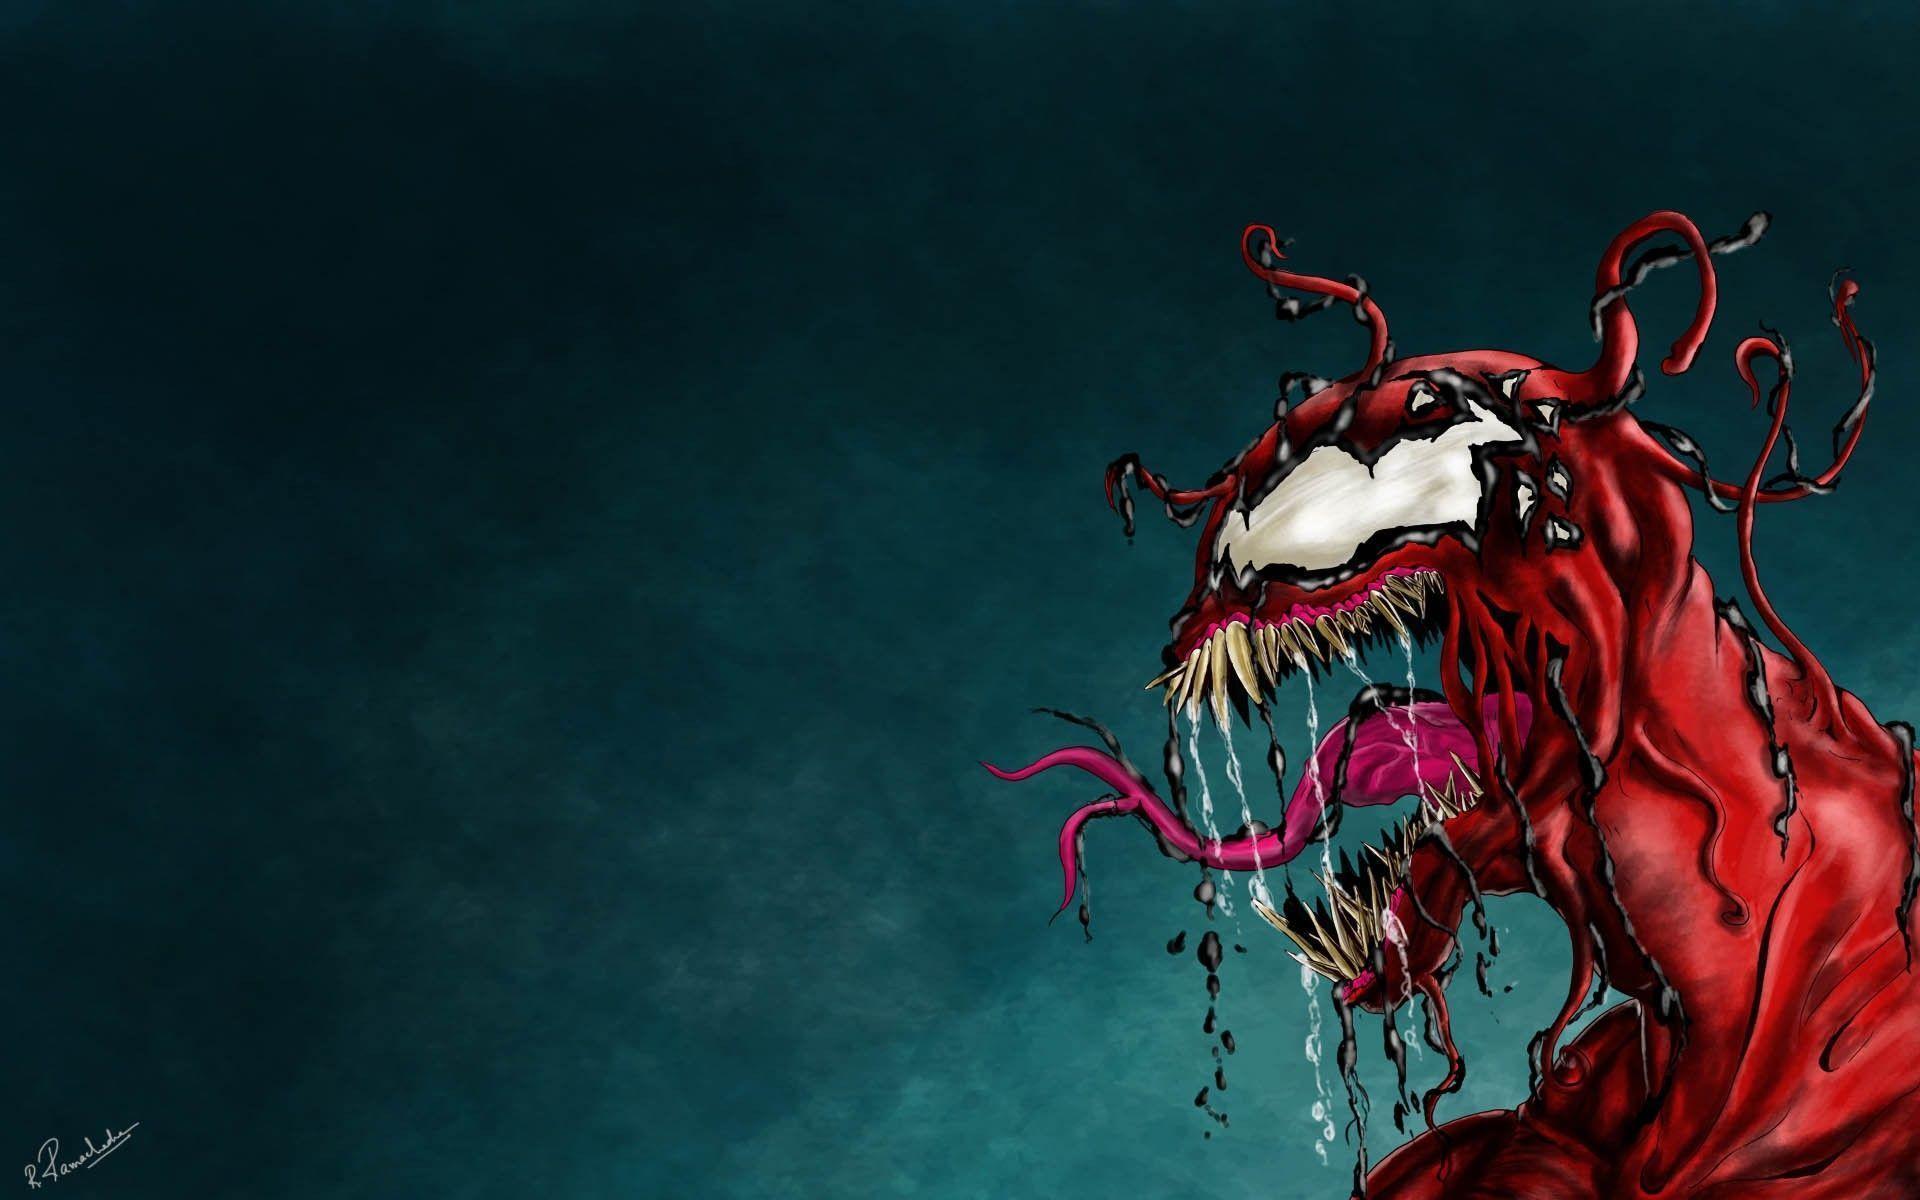 venom wallpaper hd 1920x1080 - photo #27